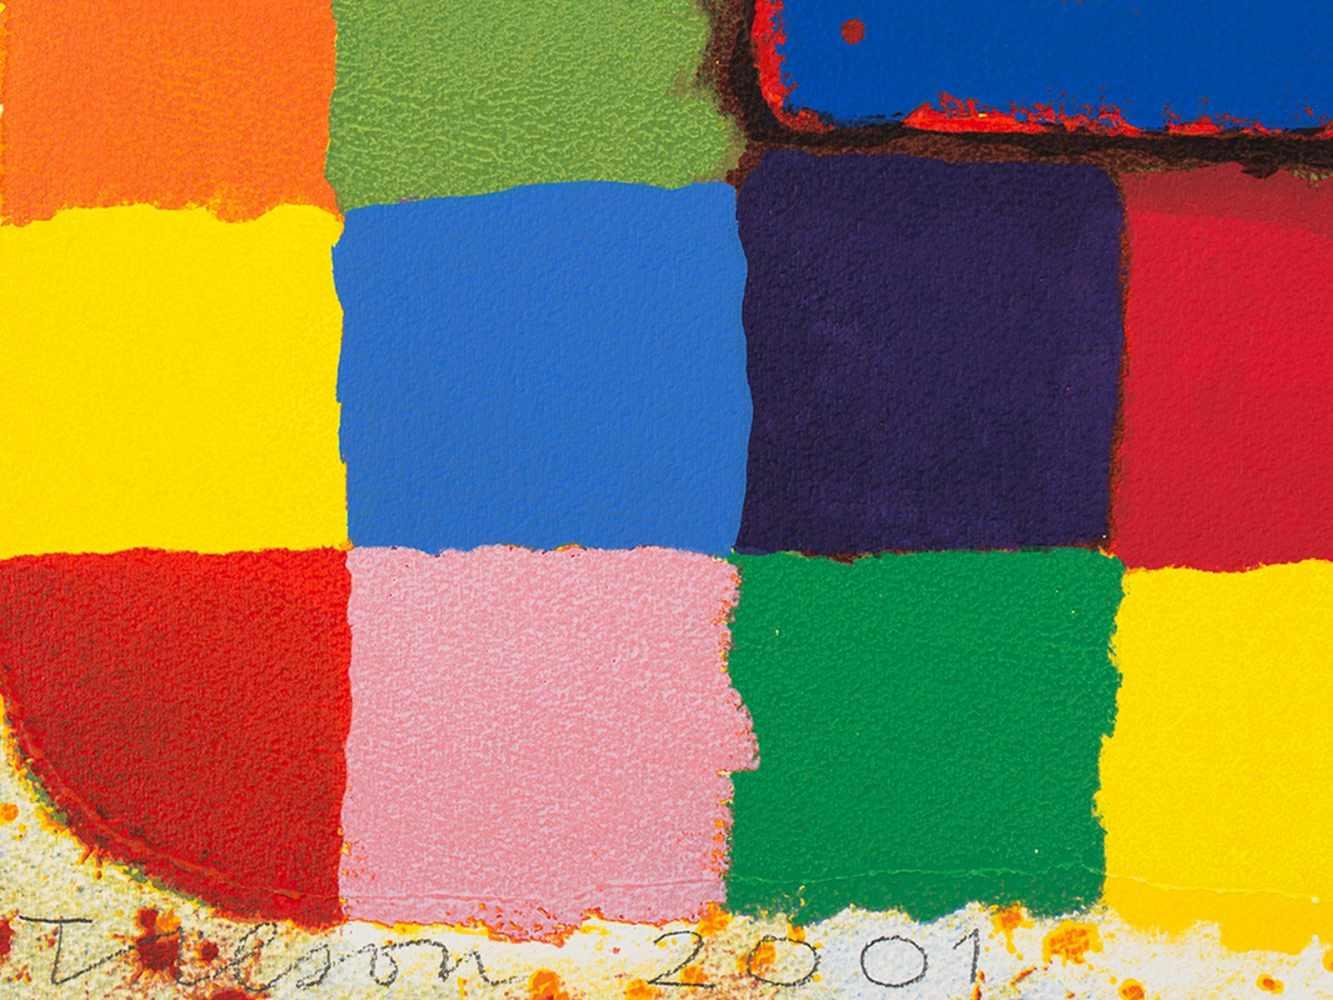 Joe Tilson, Conjunctions, 3 Serigraphs in Colors, 2001 - Image 3 of 7